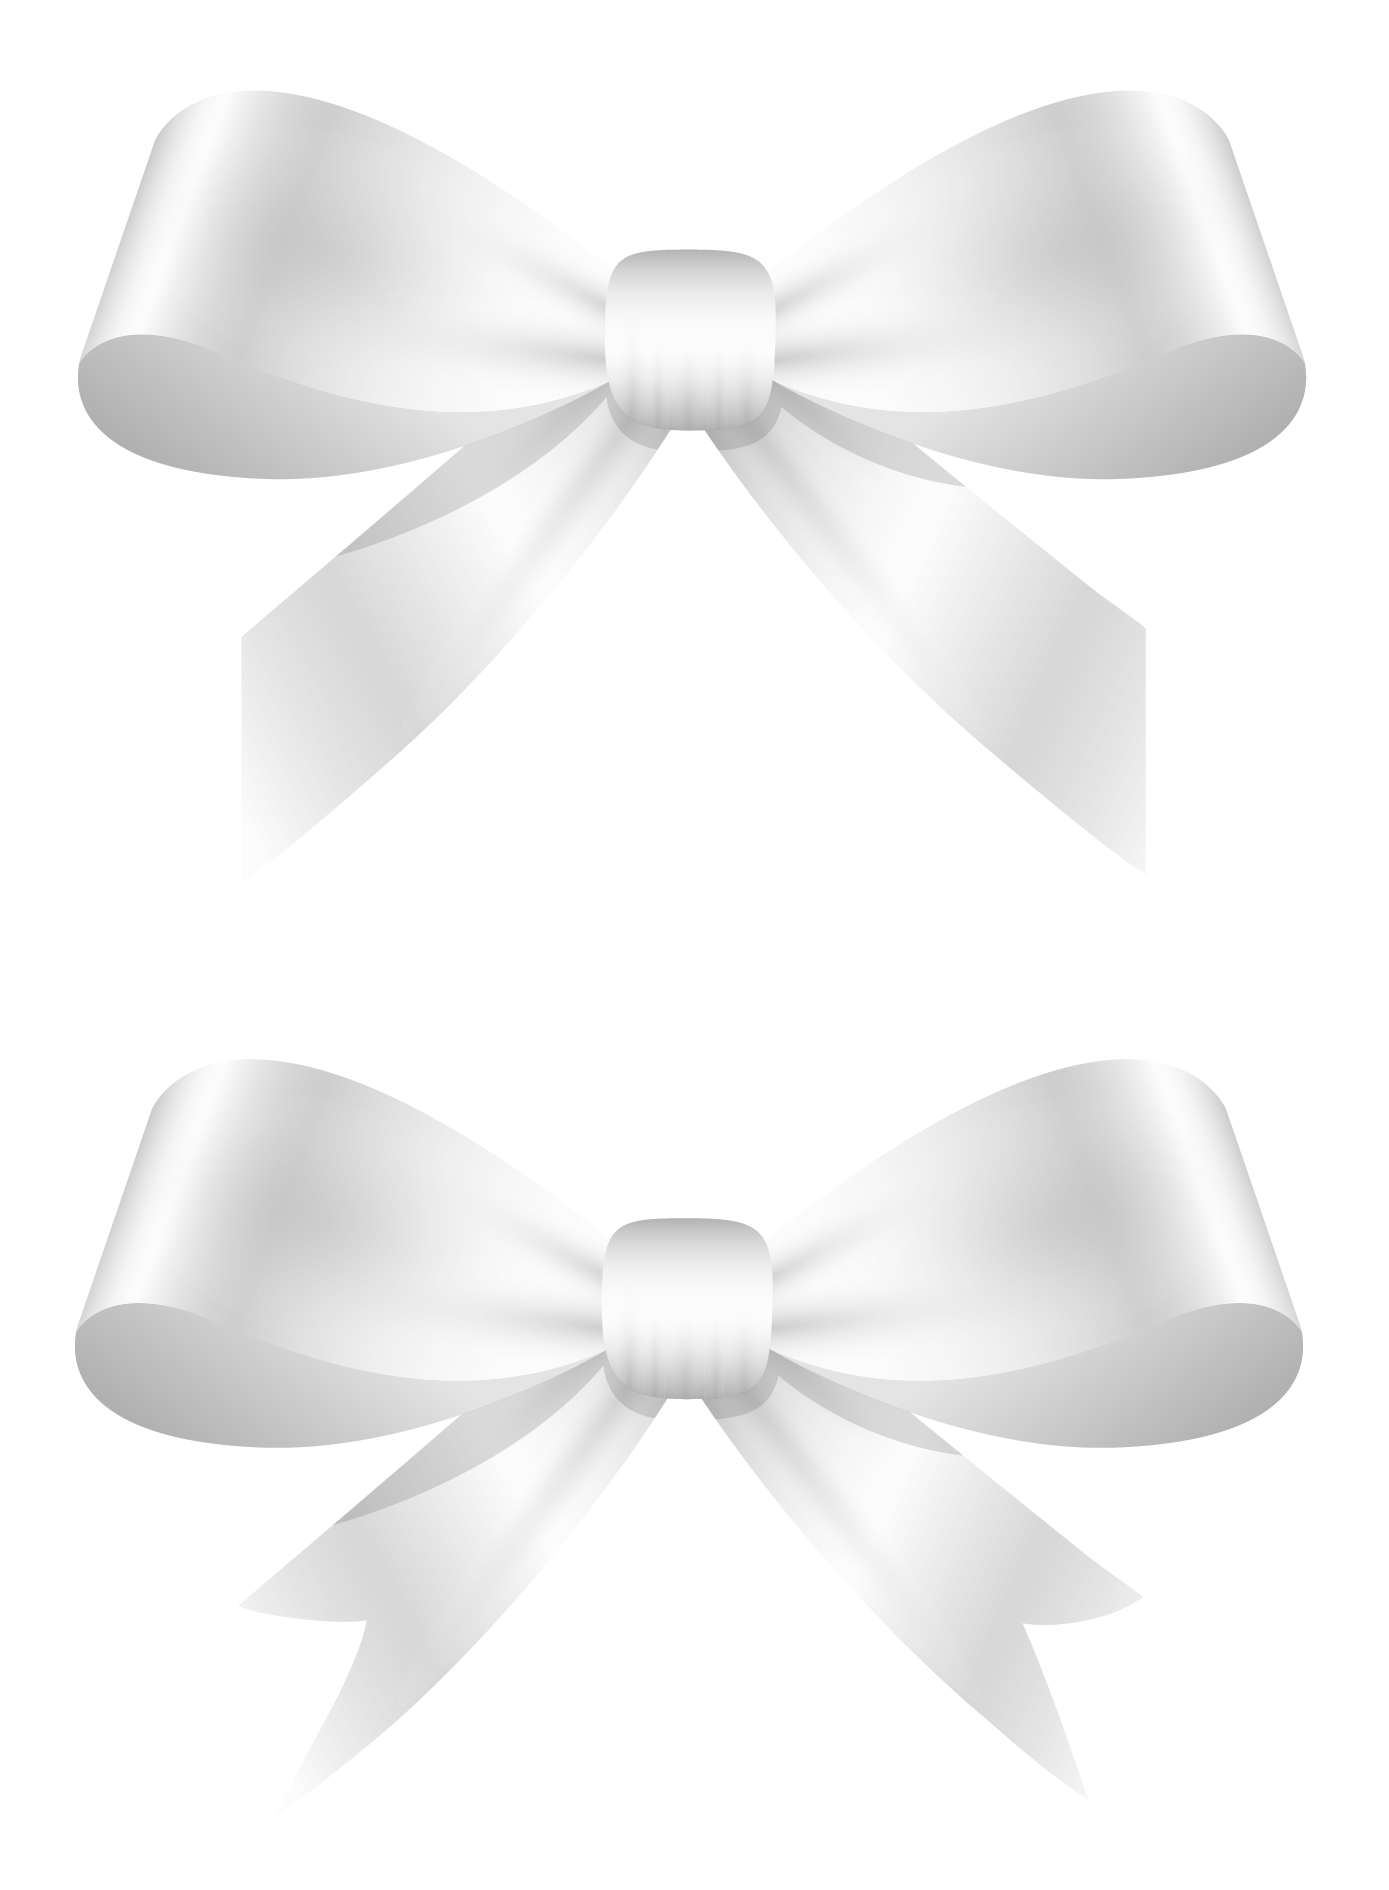 Pin by Ummuhan Yanbolu on Desenler.